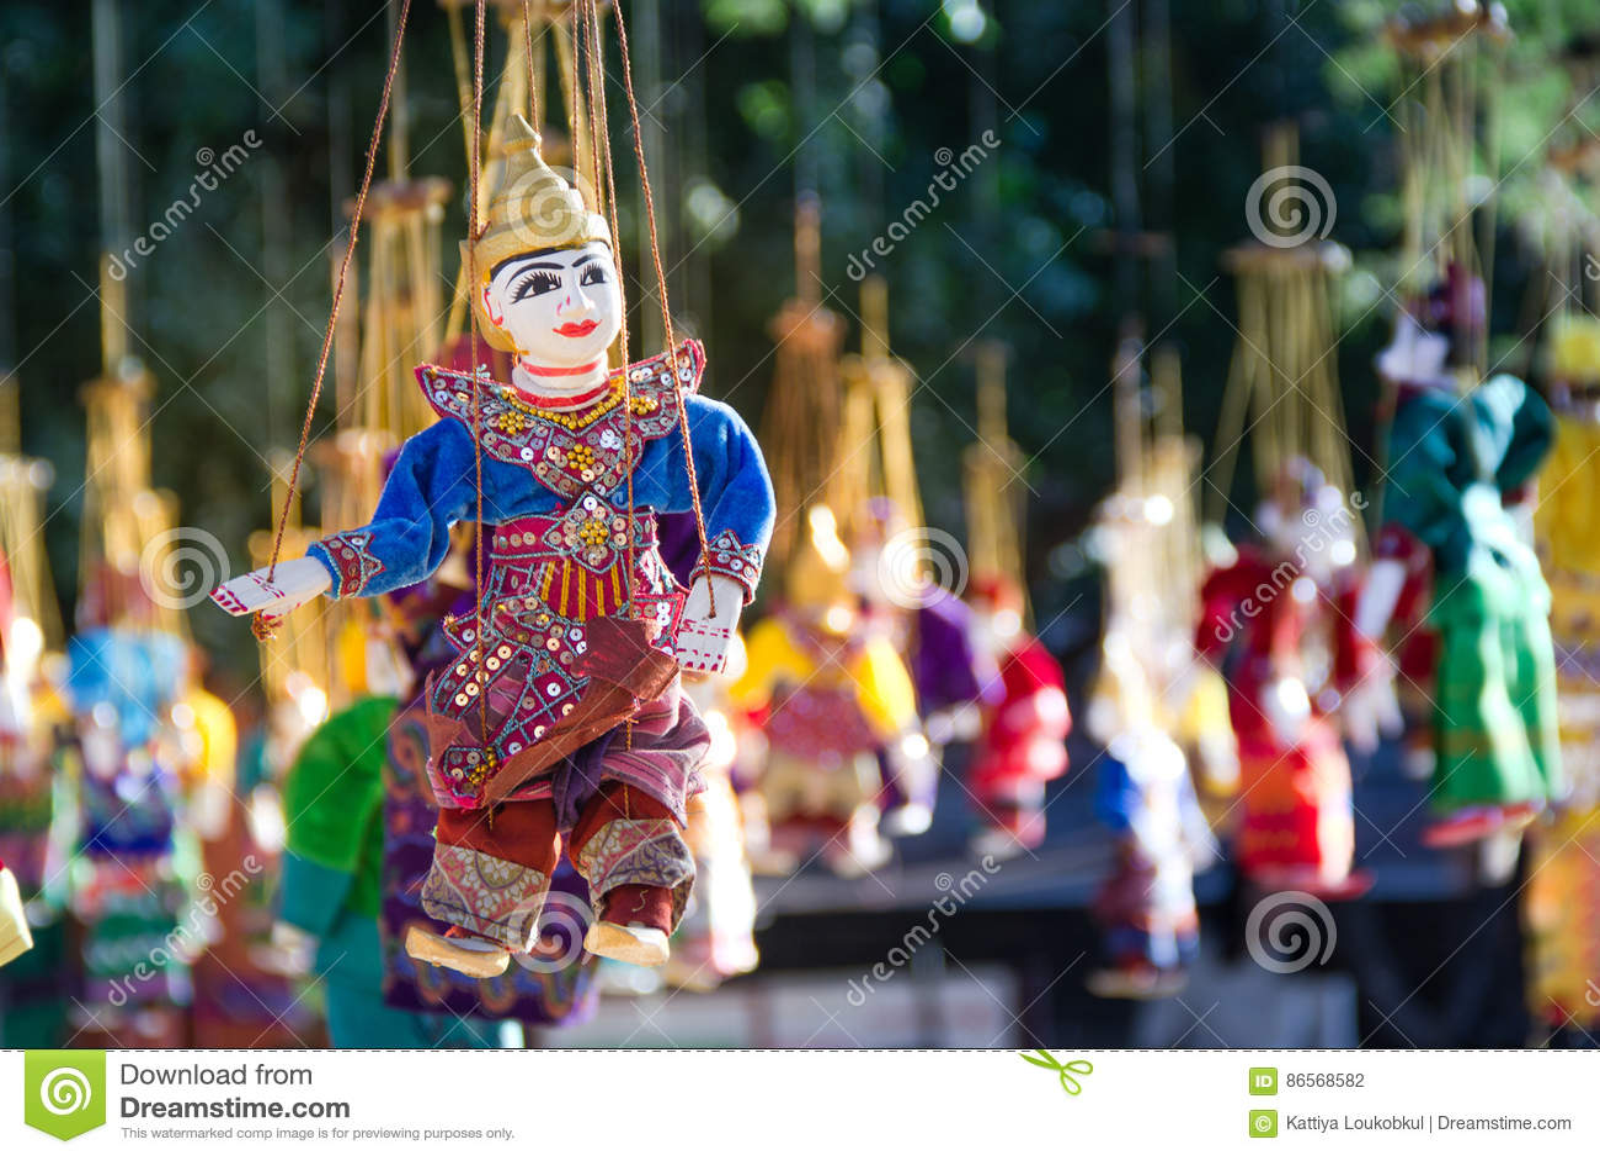 Myanmar tradition puppet souvenir